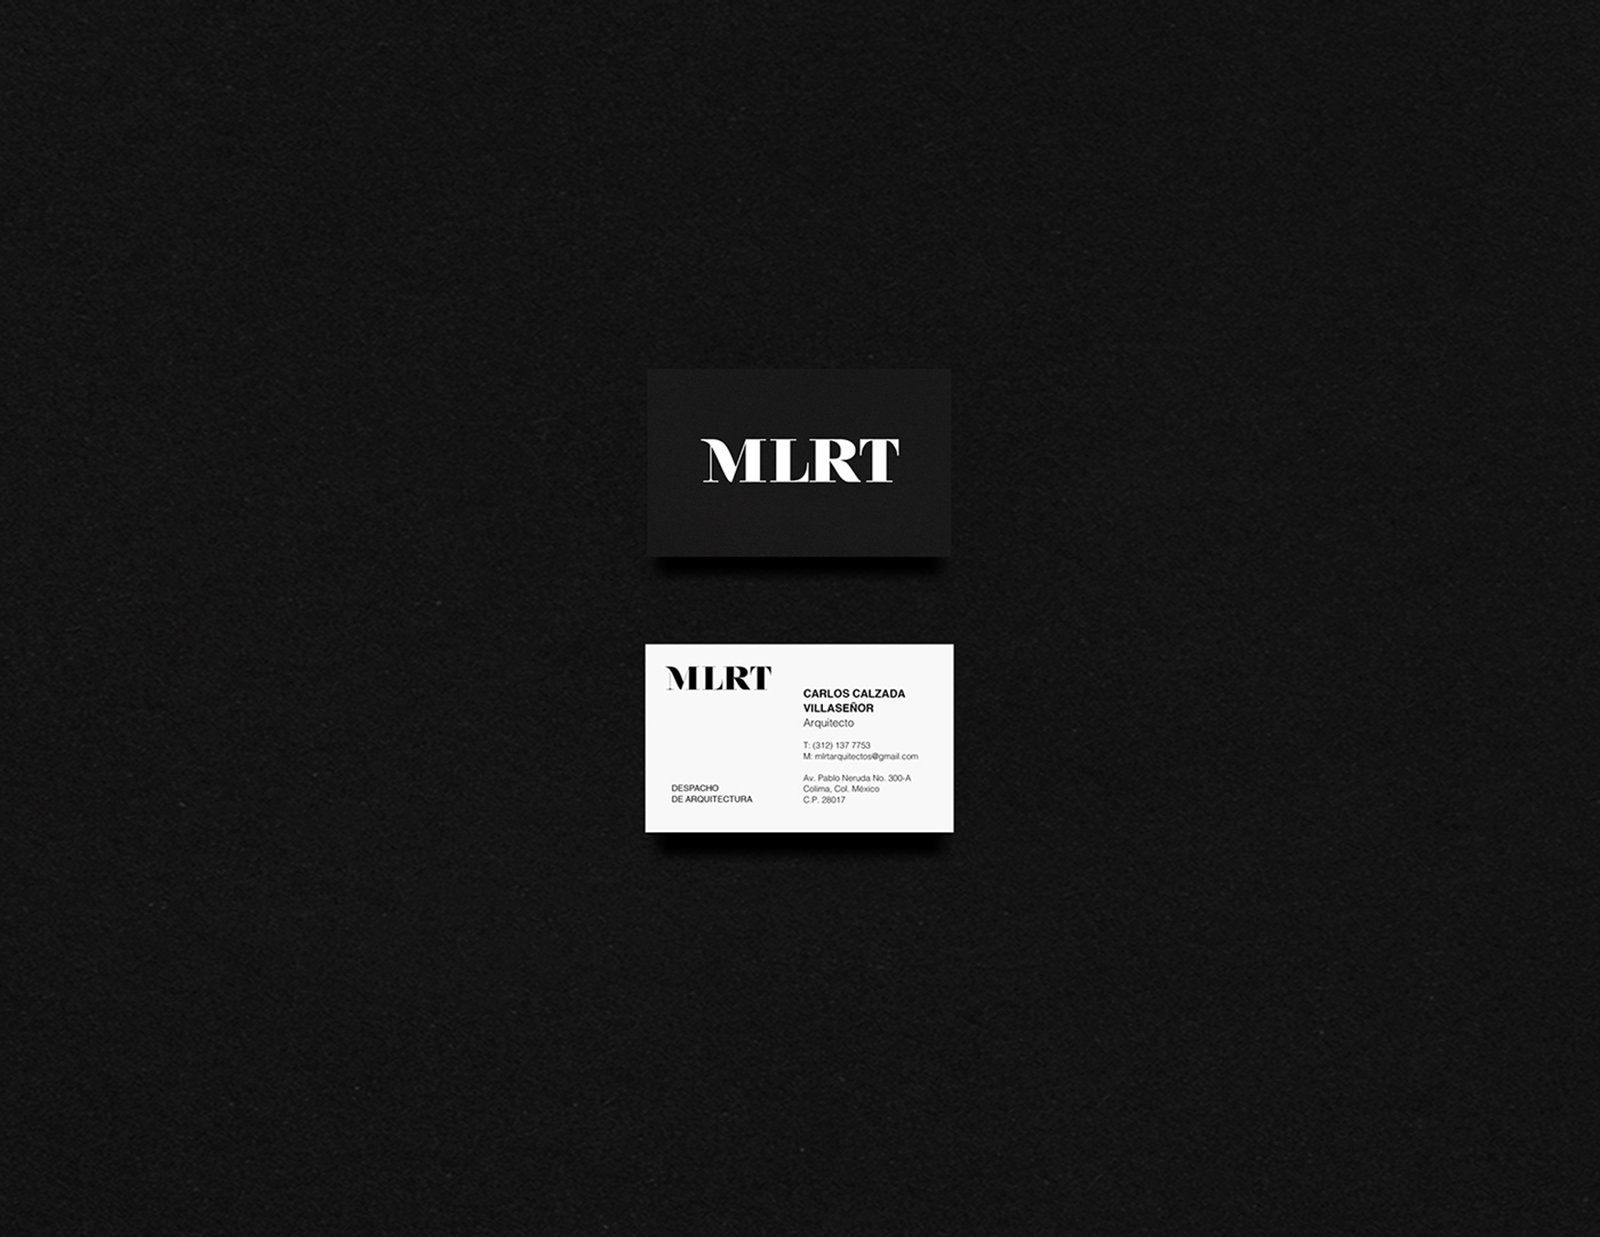 MLRT 企業品牌視覺VI形象設計欣賞-VI設計1